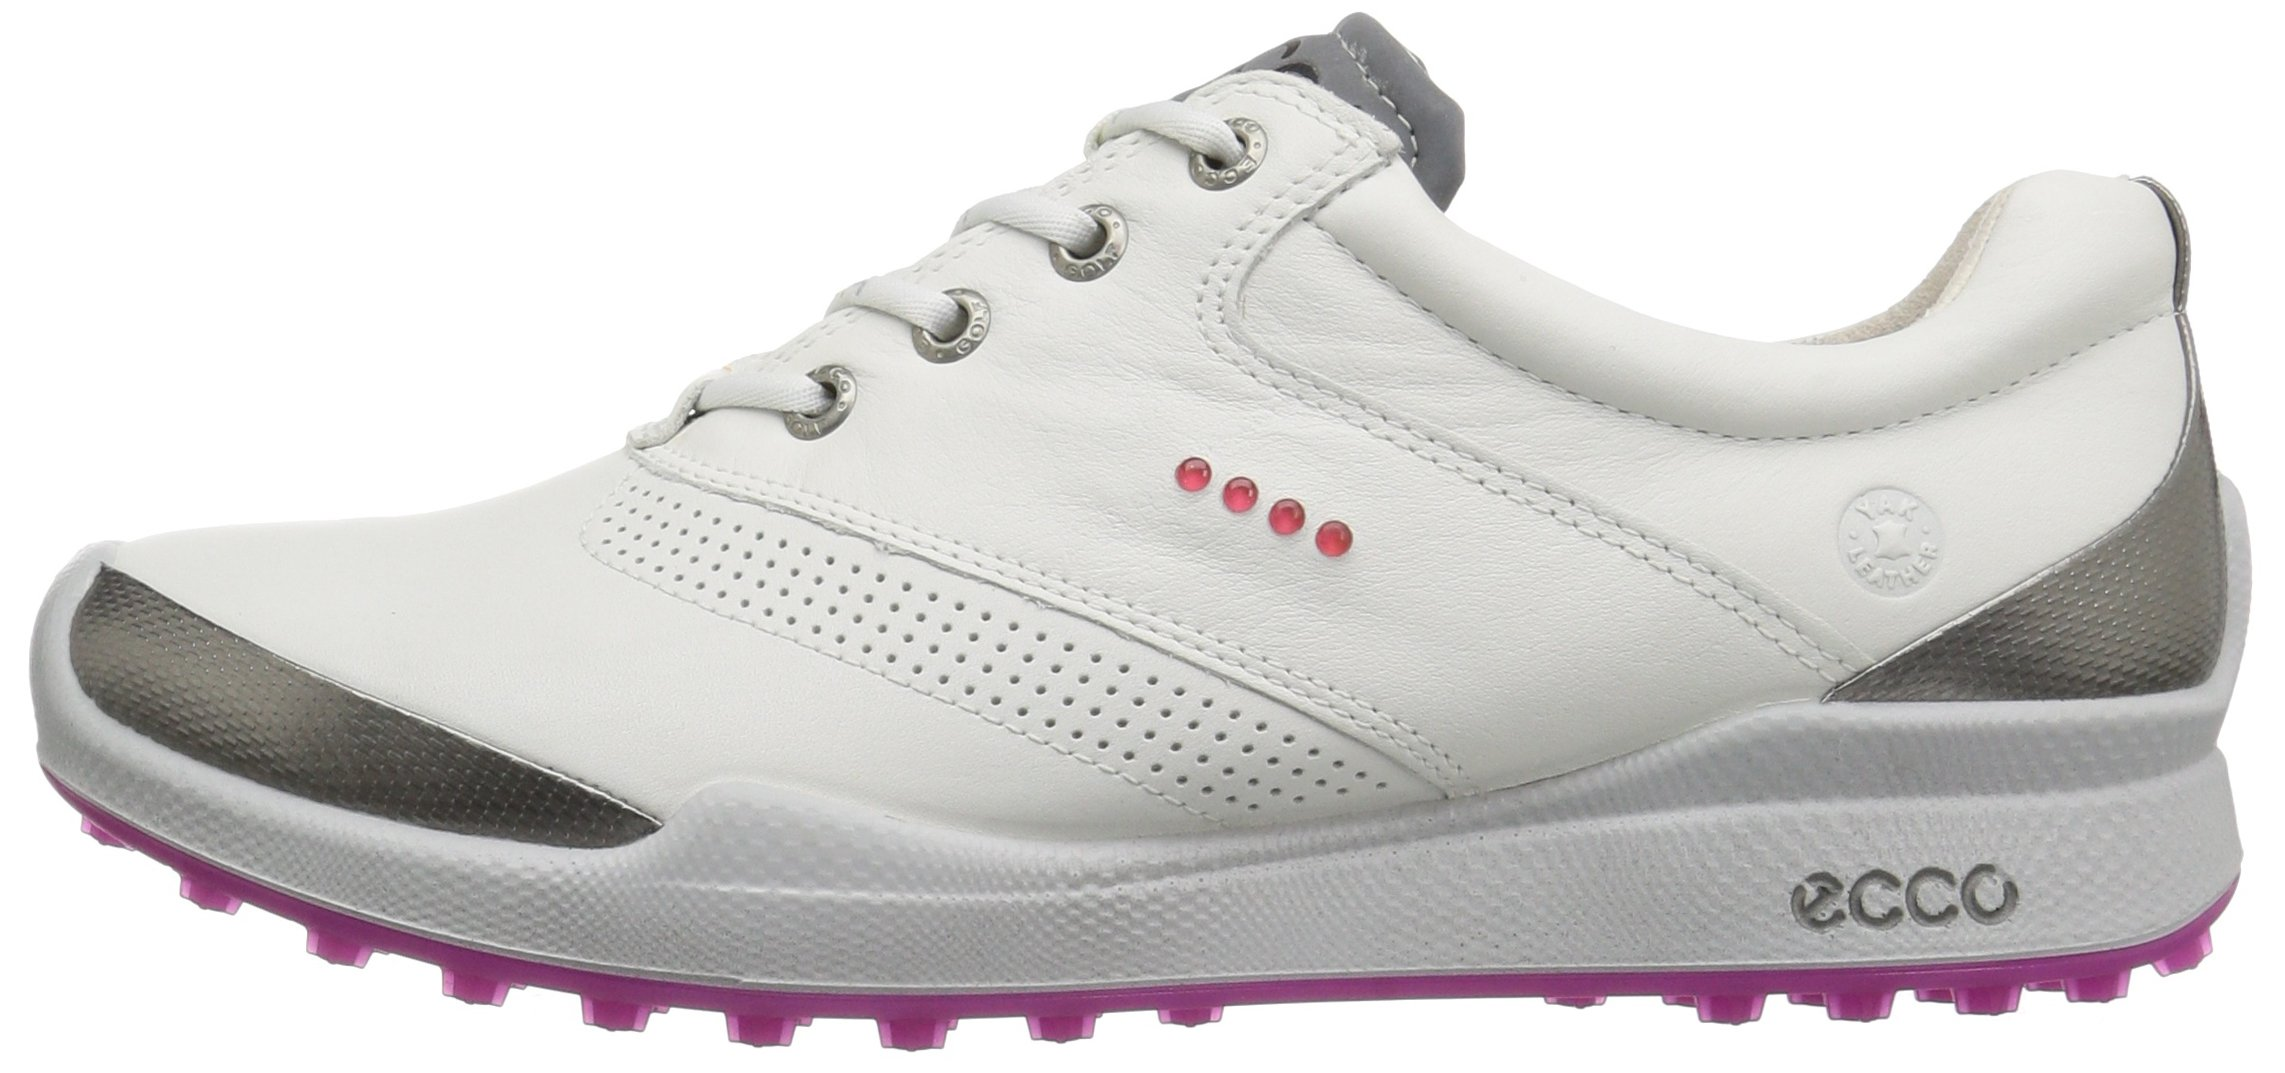 ECCO Women's Biom Hybrid Hydromax Golf Shoe, White/Candy, 39 EU/8-8.5 M US by ECCO (Image #5)